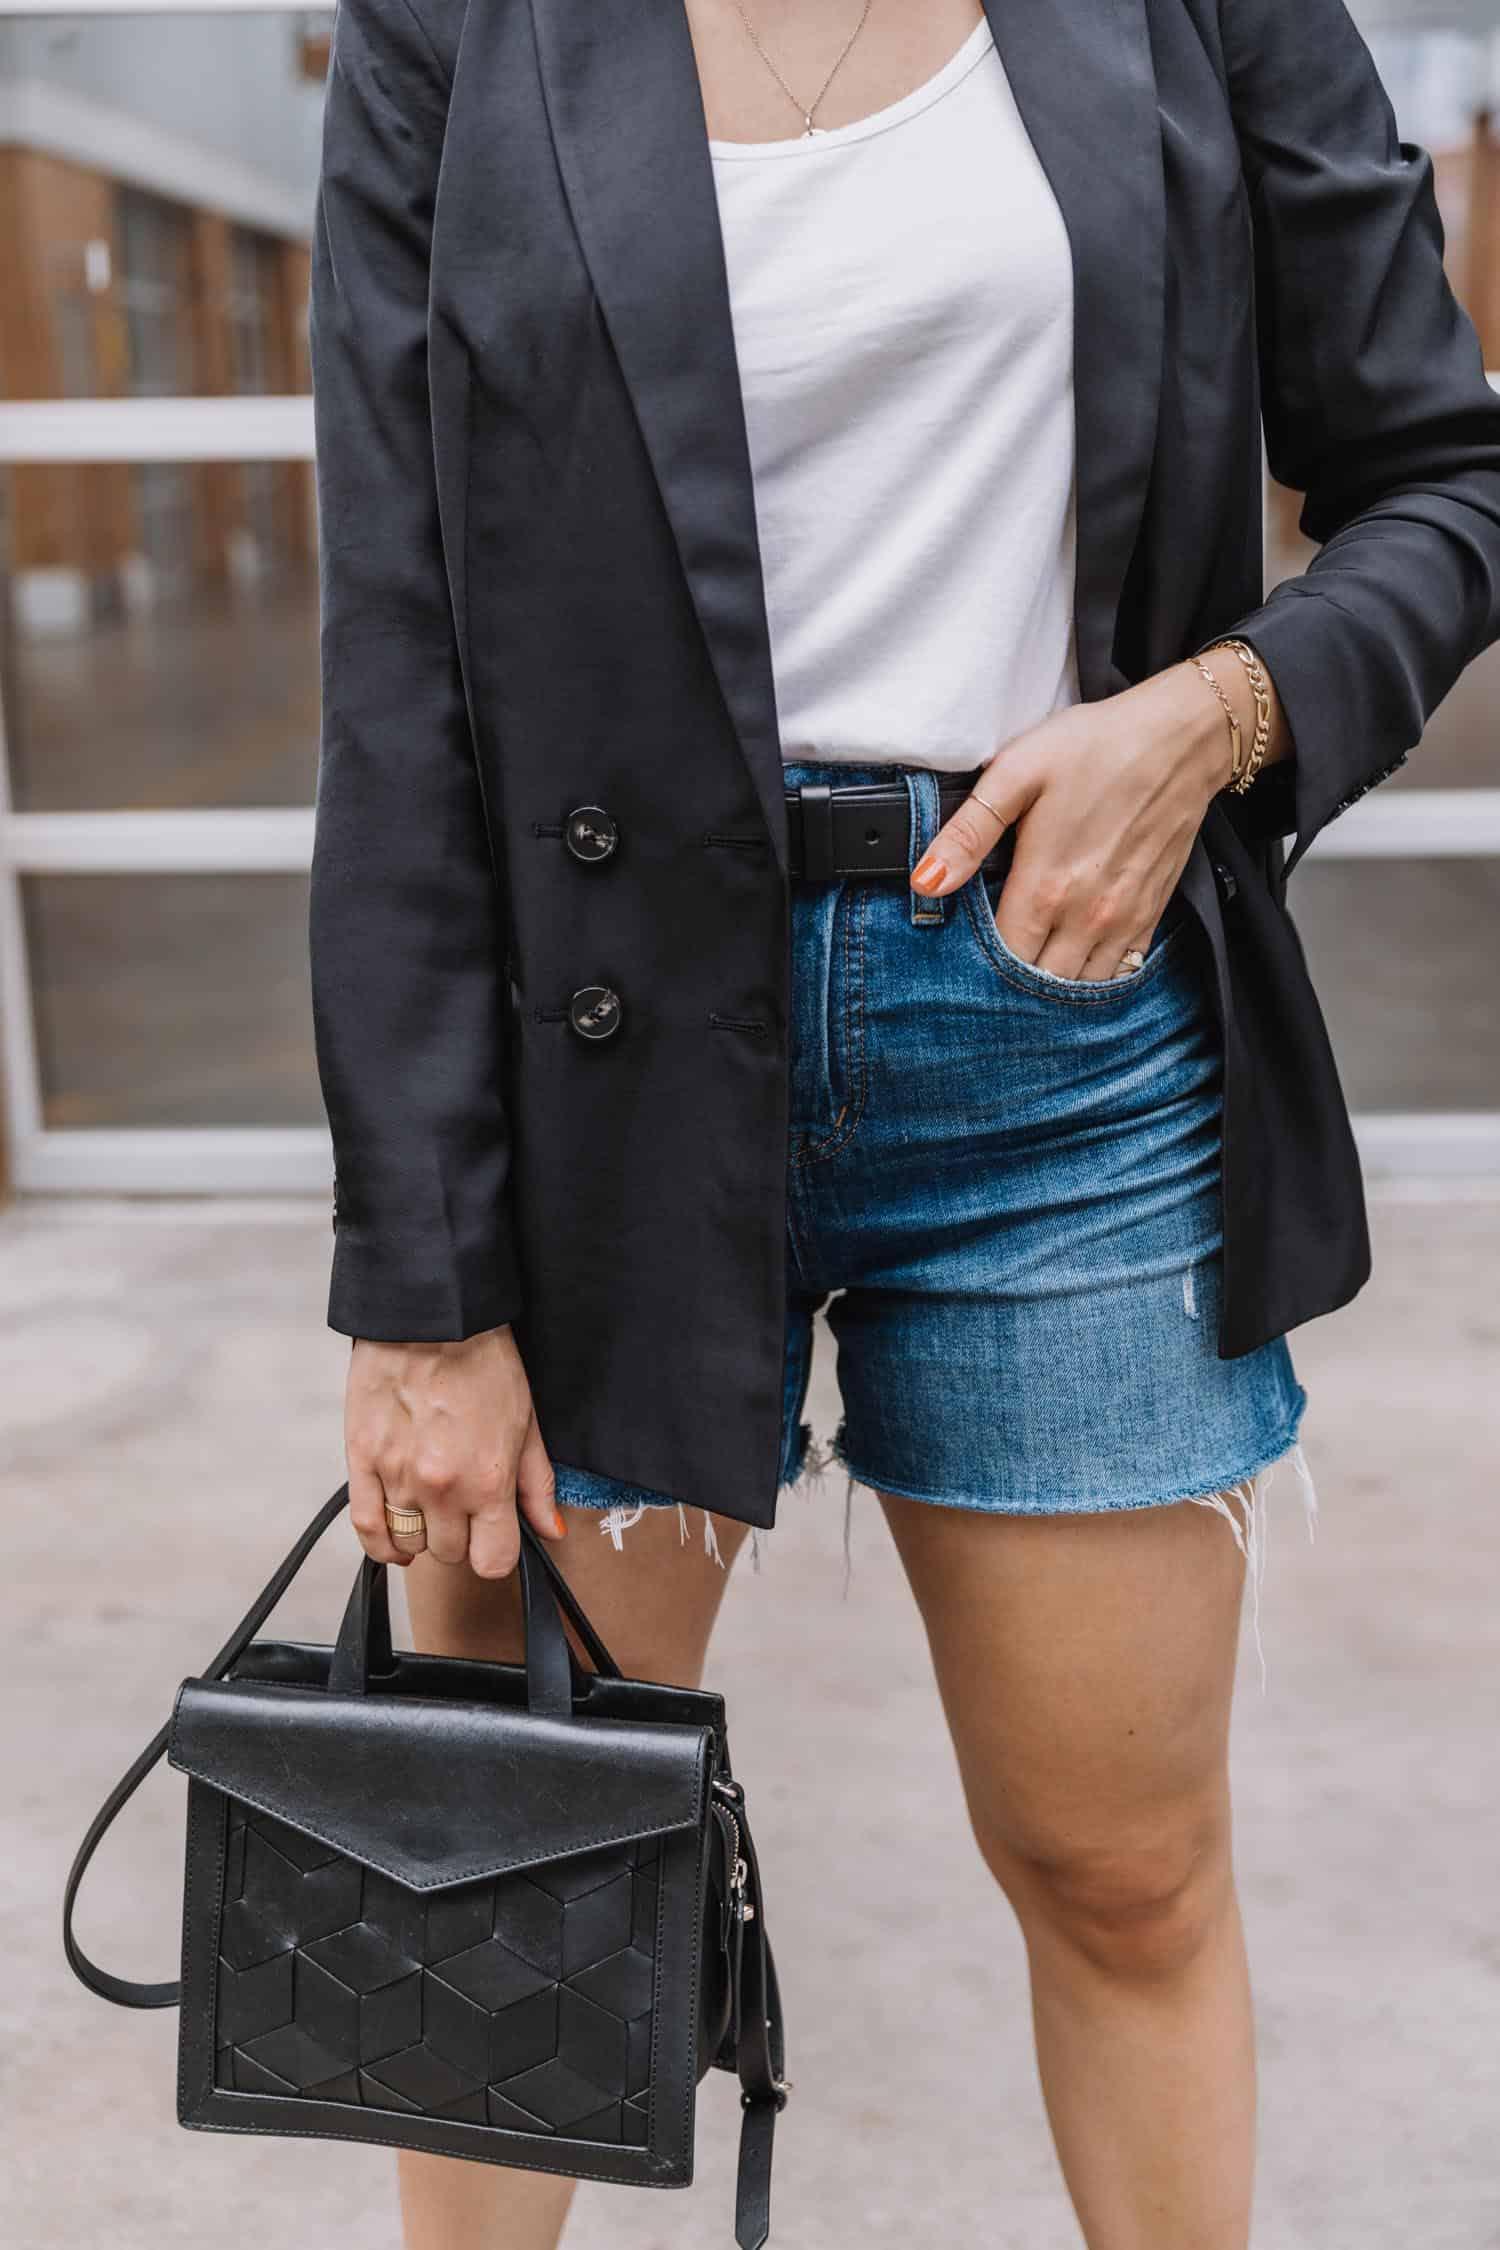 denim shorts with a black blazer